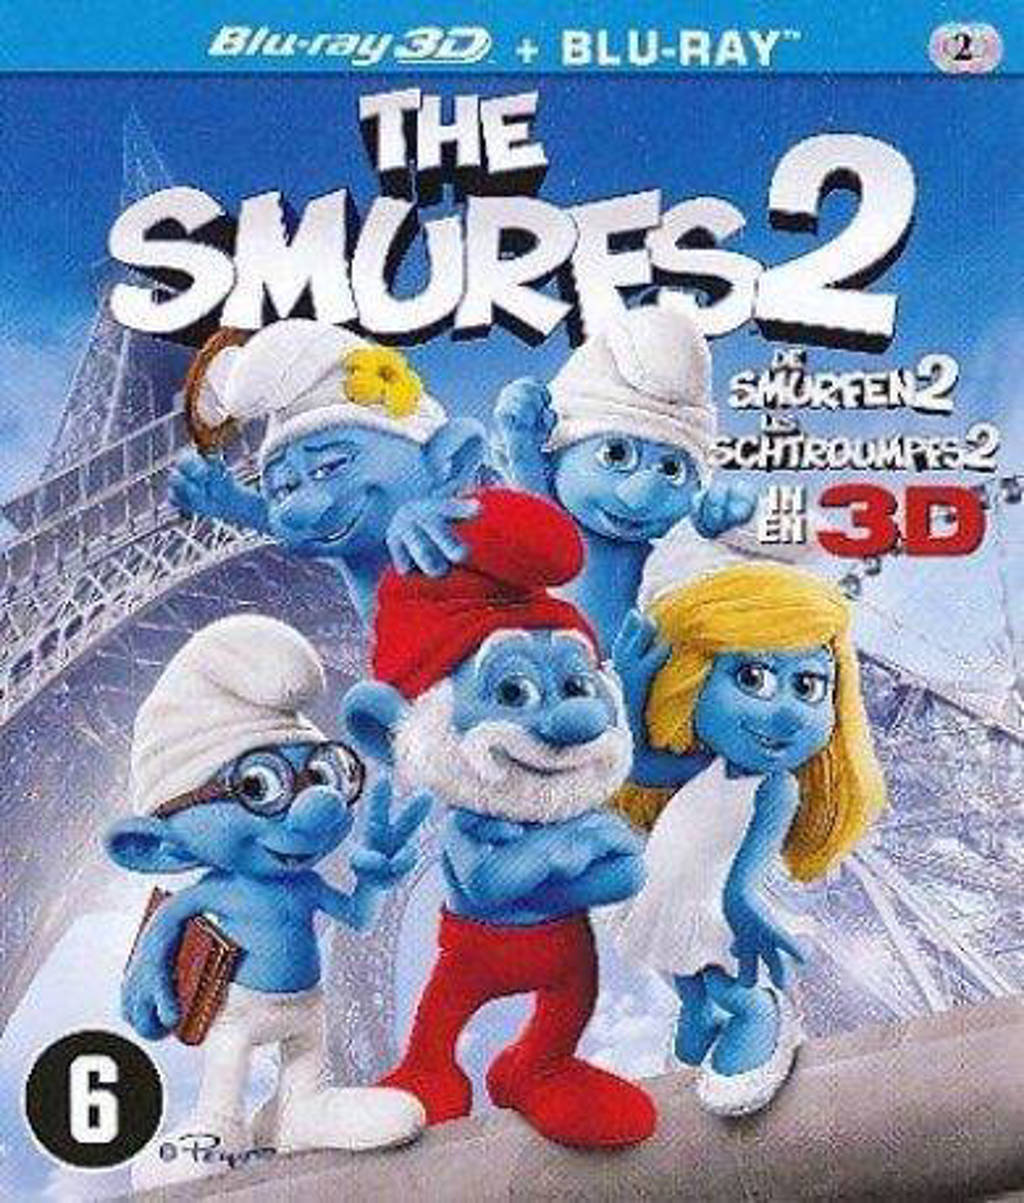 De smurfen 2 (2D + 3D) (Blu-ray)